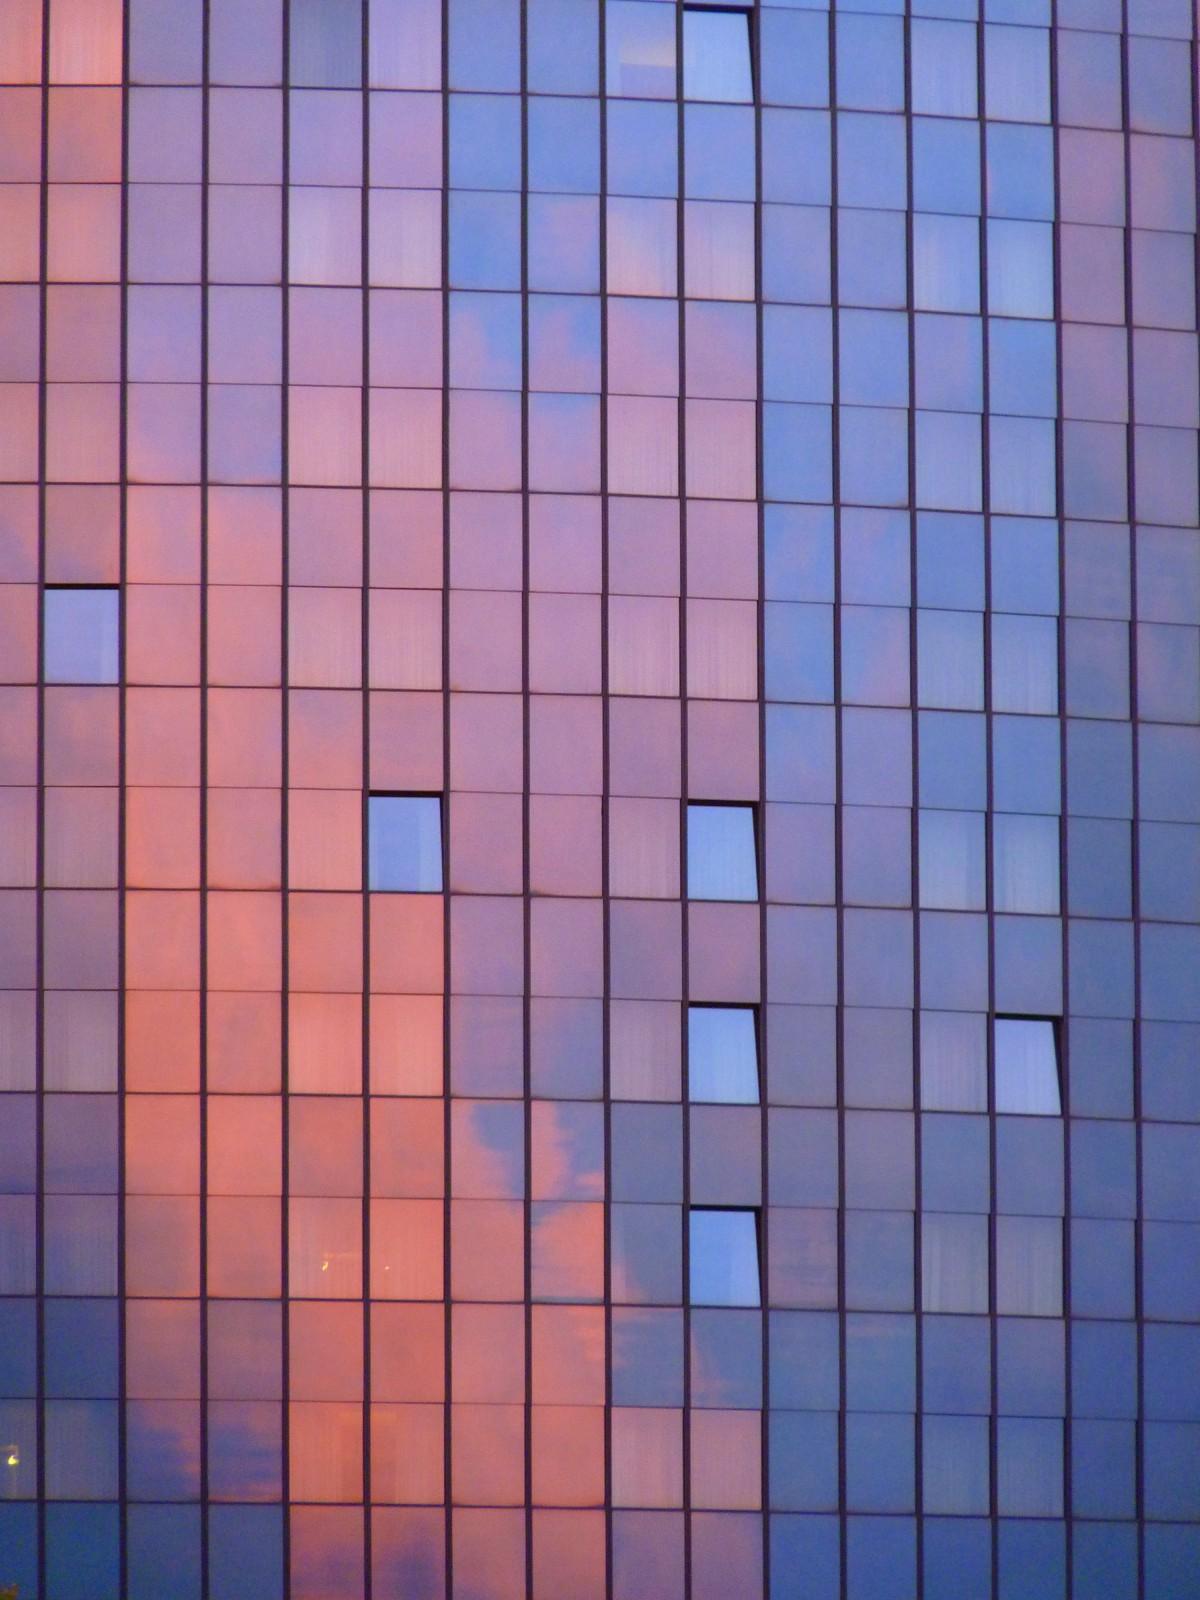 Free images architecture floor skyscraper wall for Designhotel ulm